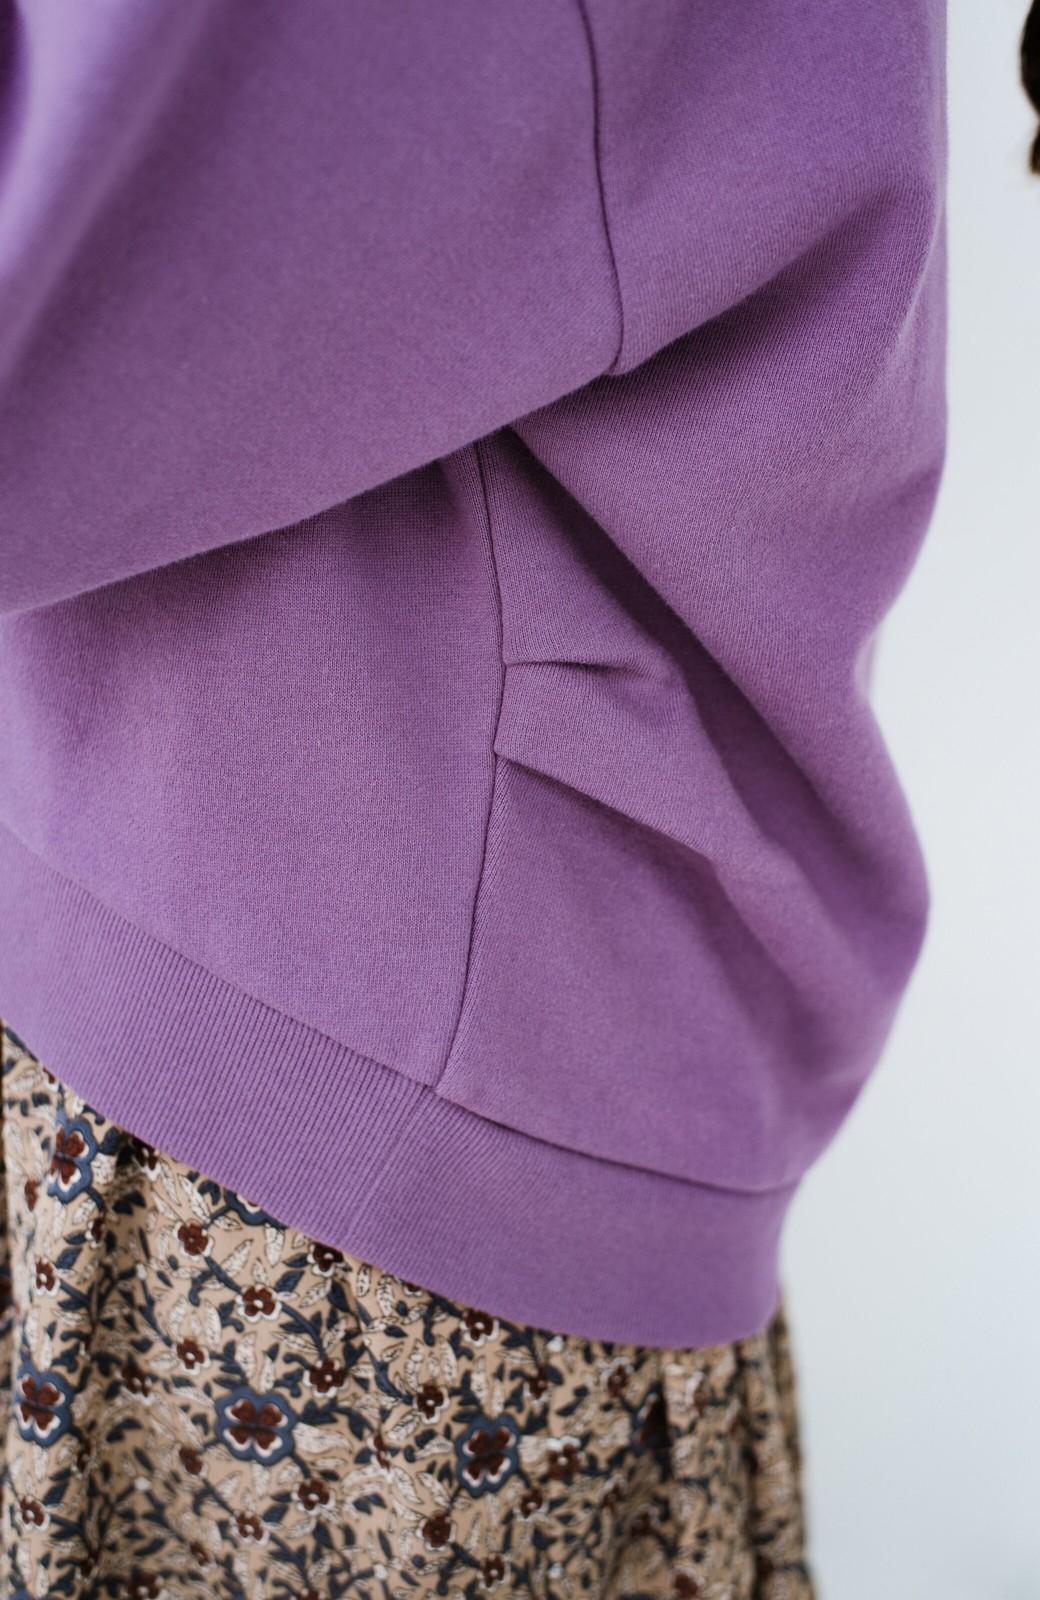 haco! PBPオーガニックコットン 短め丈でバランスよく着られる裏起毛パーカー <パープル>の商品写真7